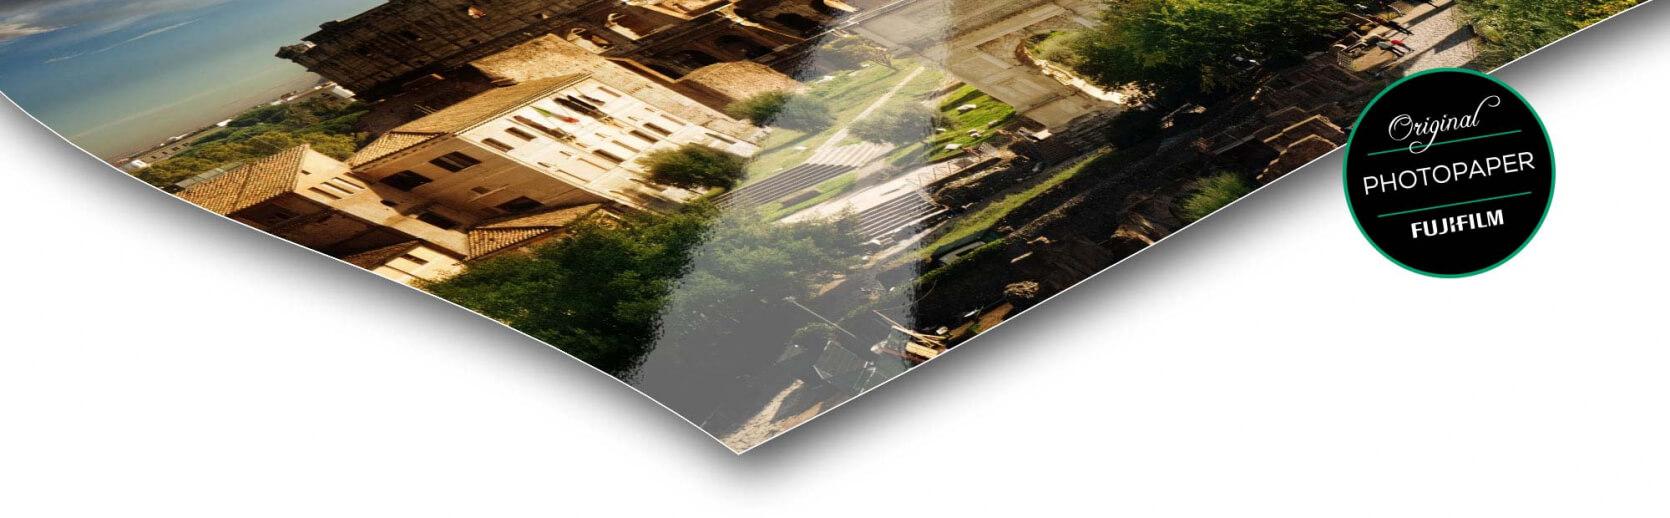 hoek fotopapier foto op forex glans